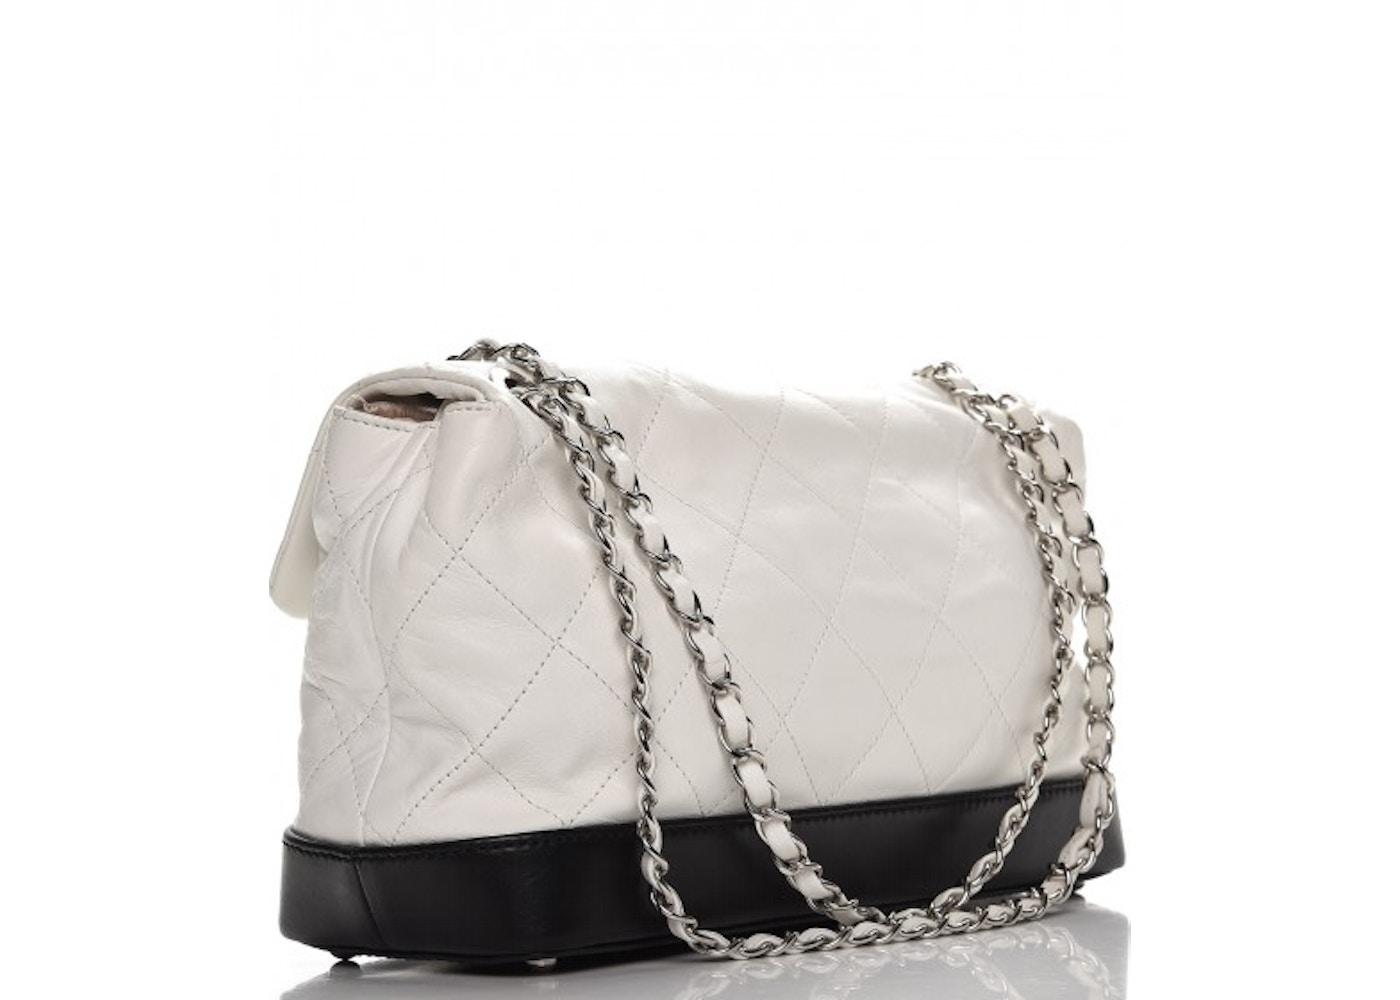 556f2fa31a1e Chanel VIP Flap Quilted Diamond White/Black